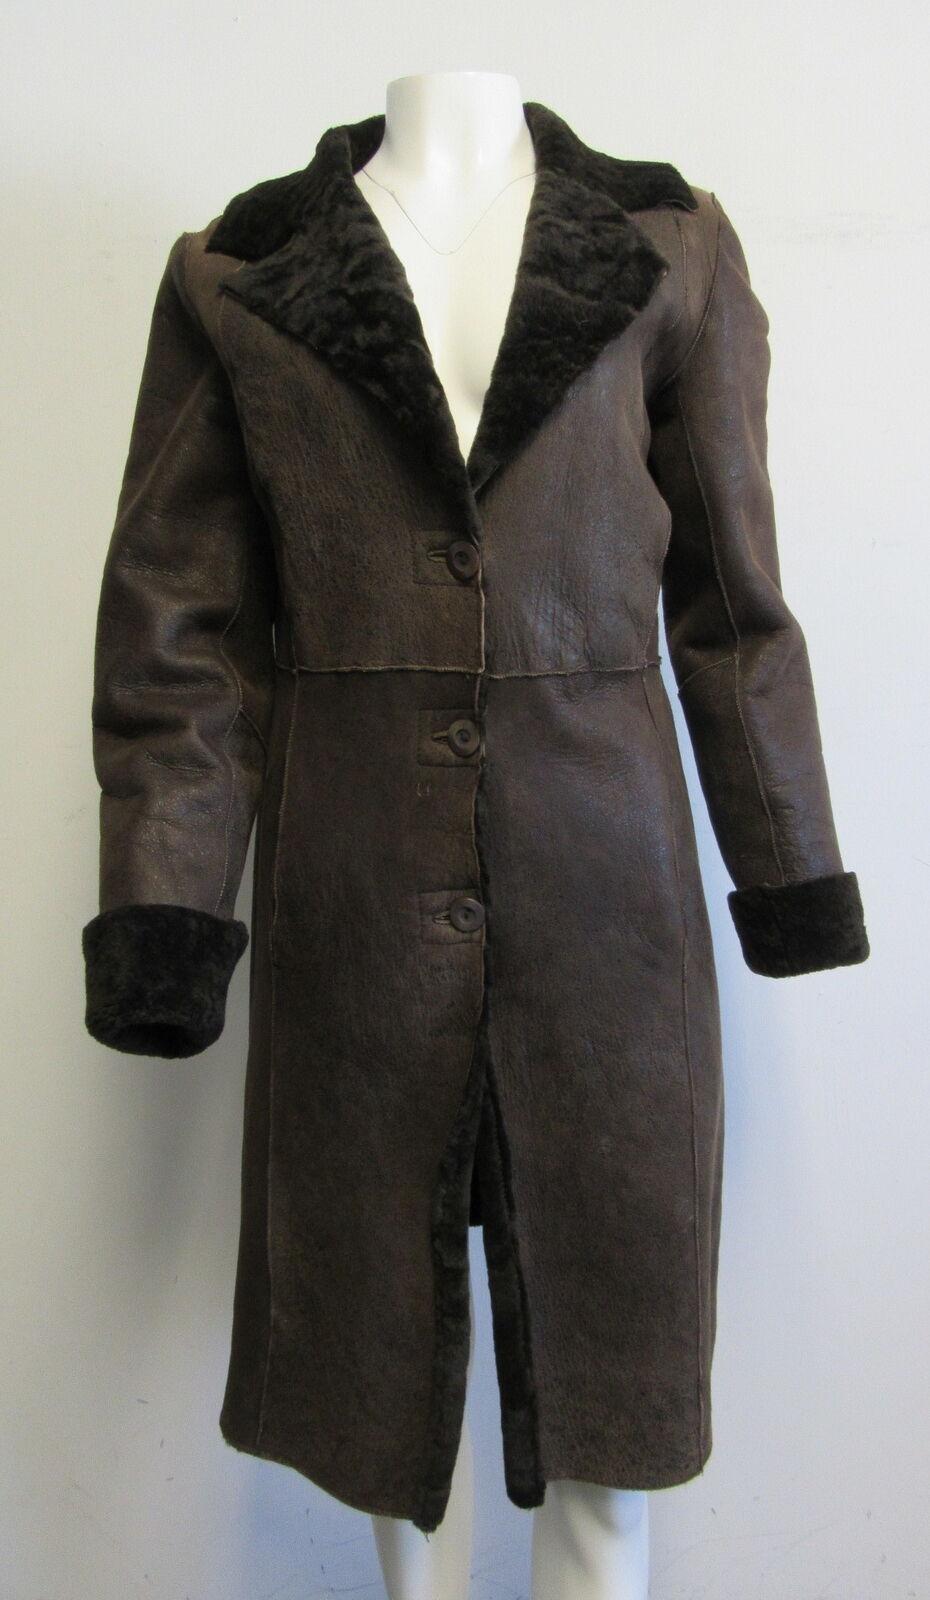 TINTORETTO brown lamb shearling 3- button coat sz I 40  US 6